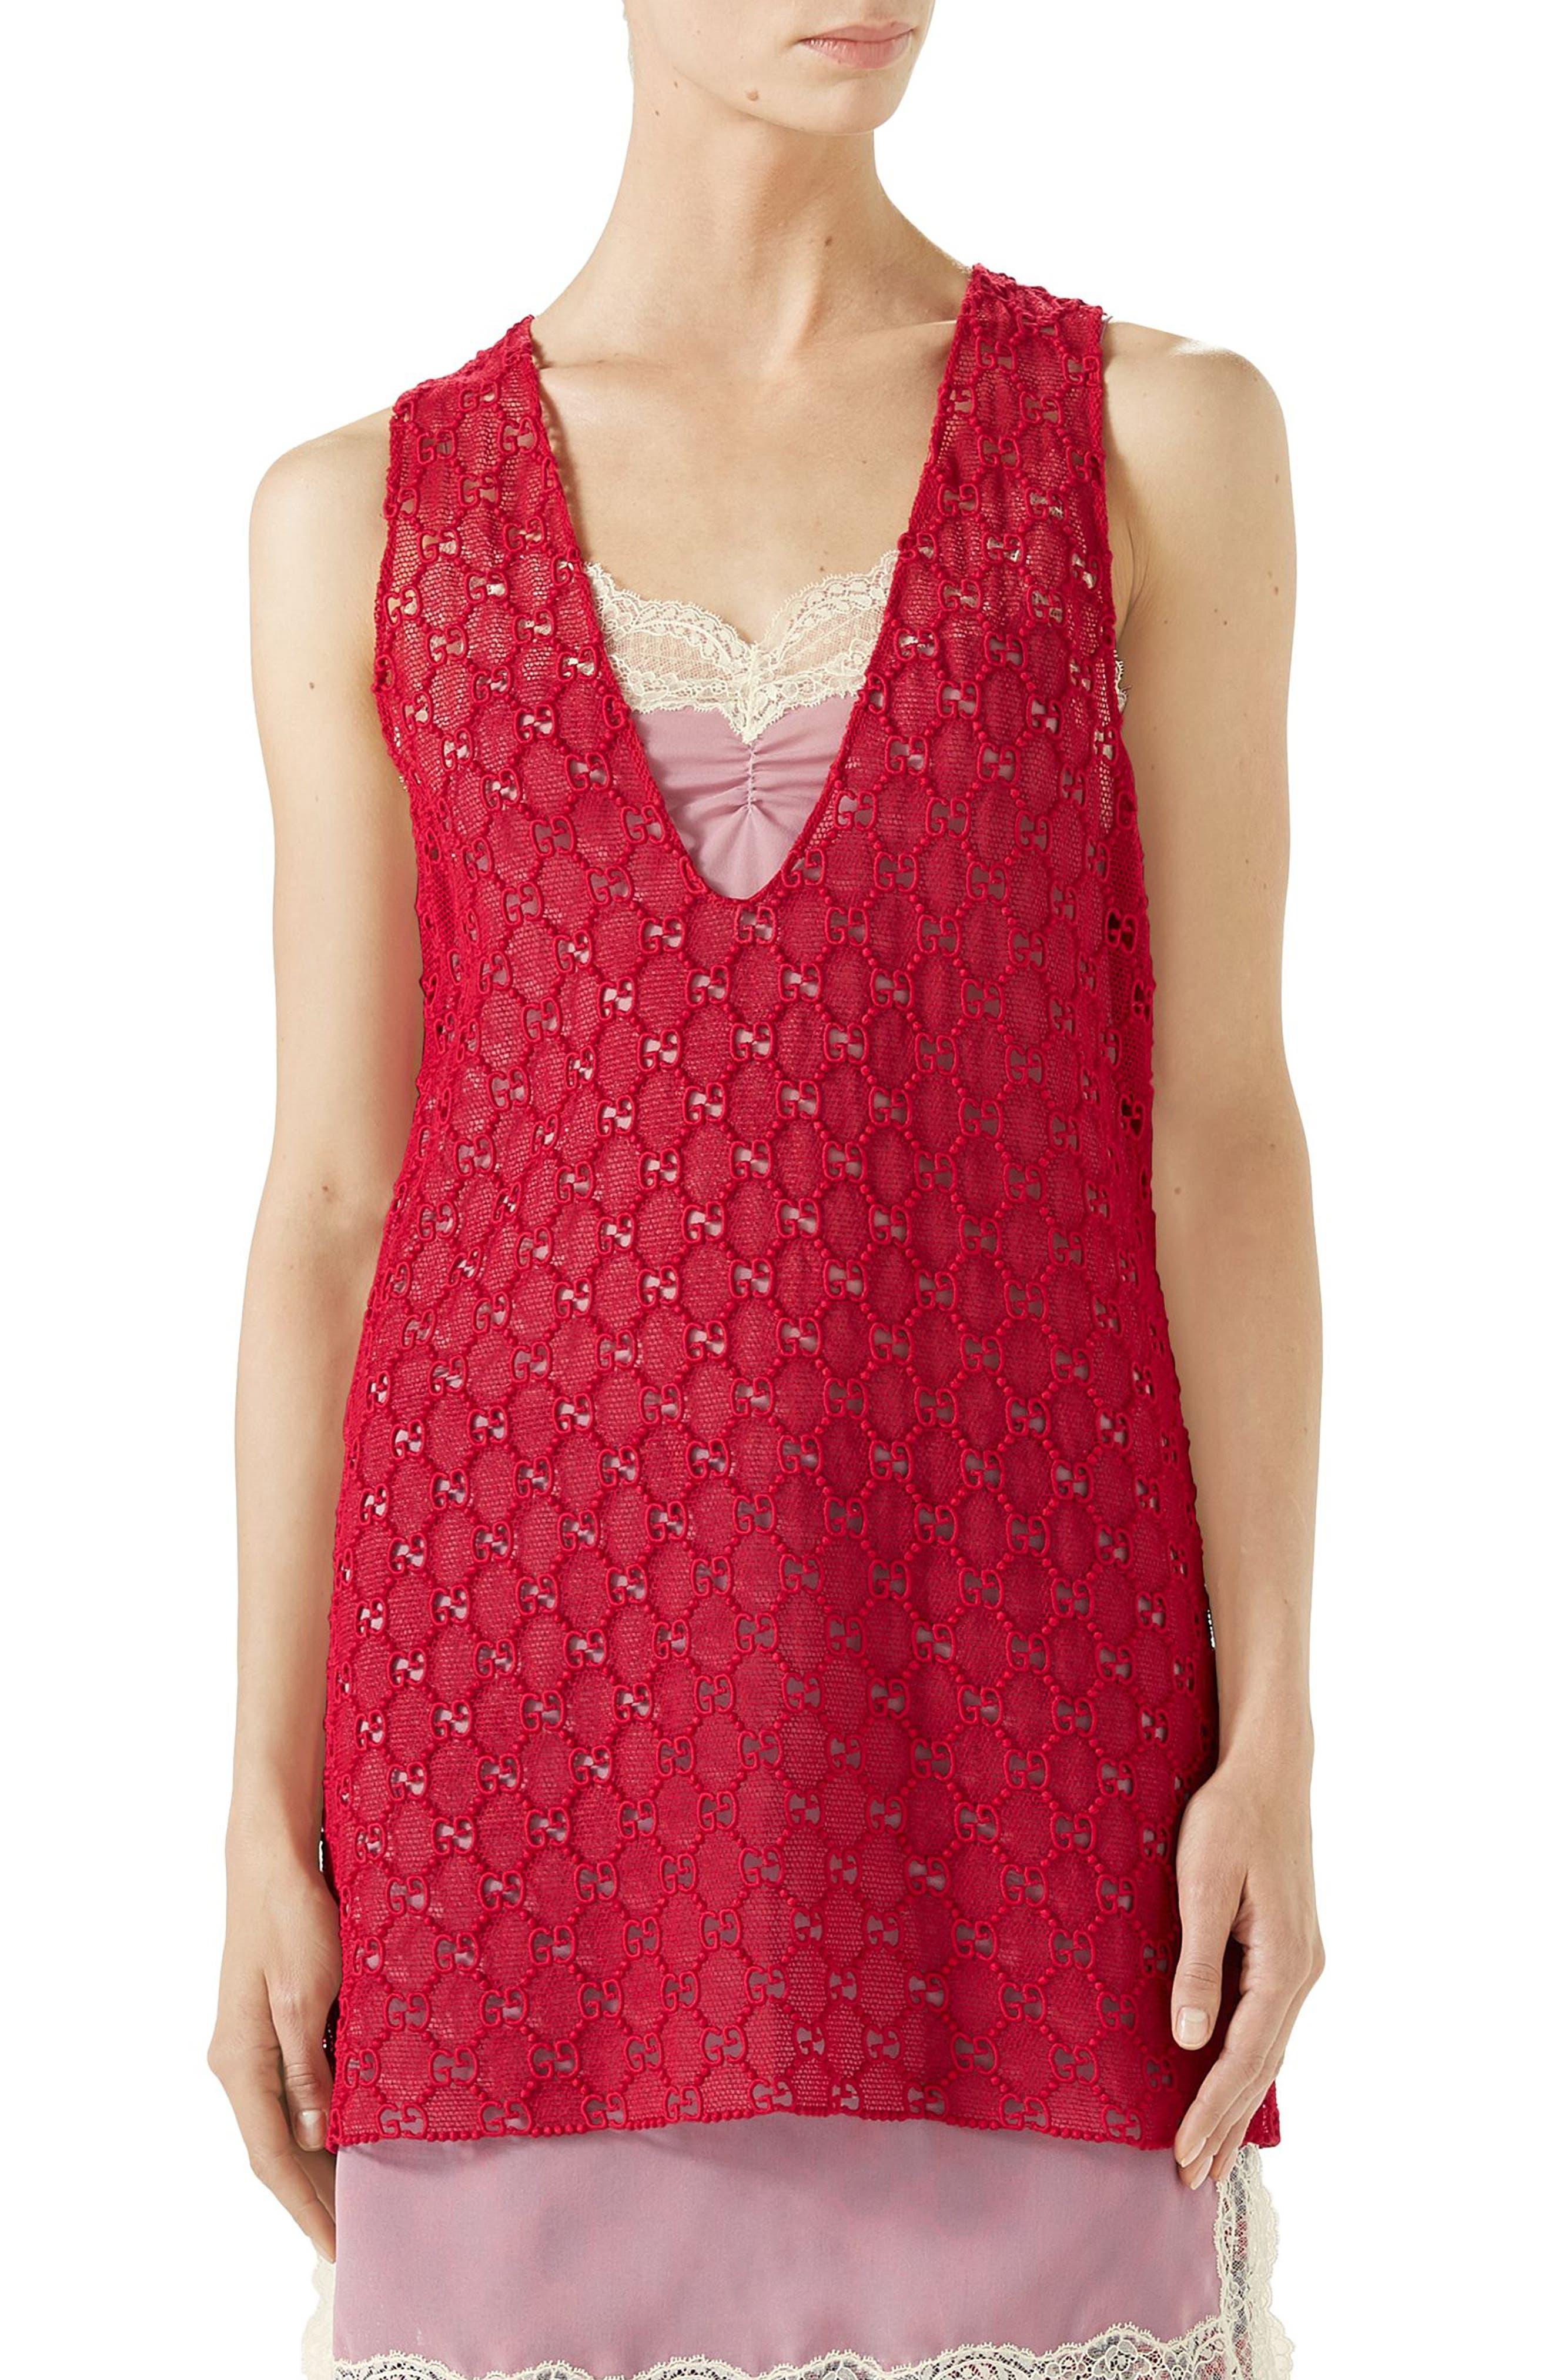 GG Macramé Top,                         Main,                         color, HEATHER RED/ ORTENSIA